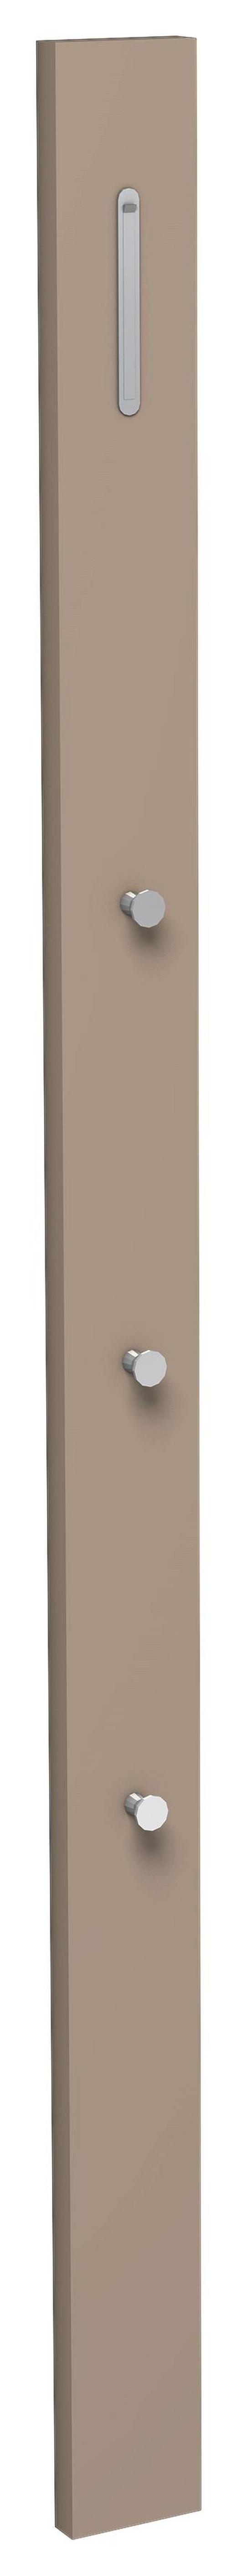 GARDEROBENPANEEL - Taupe, Design, Holzwerkstoff/Metall (10/165/3cm) - Moderano